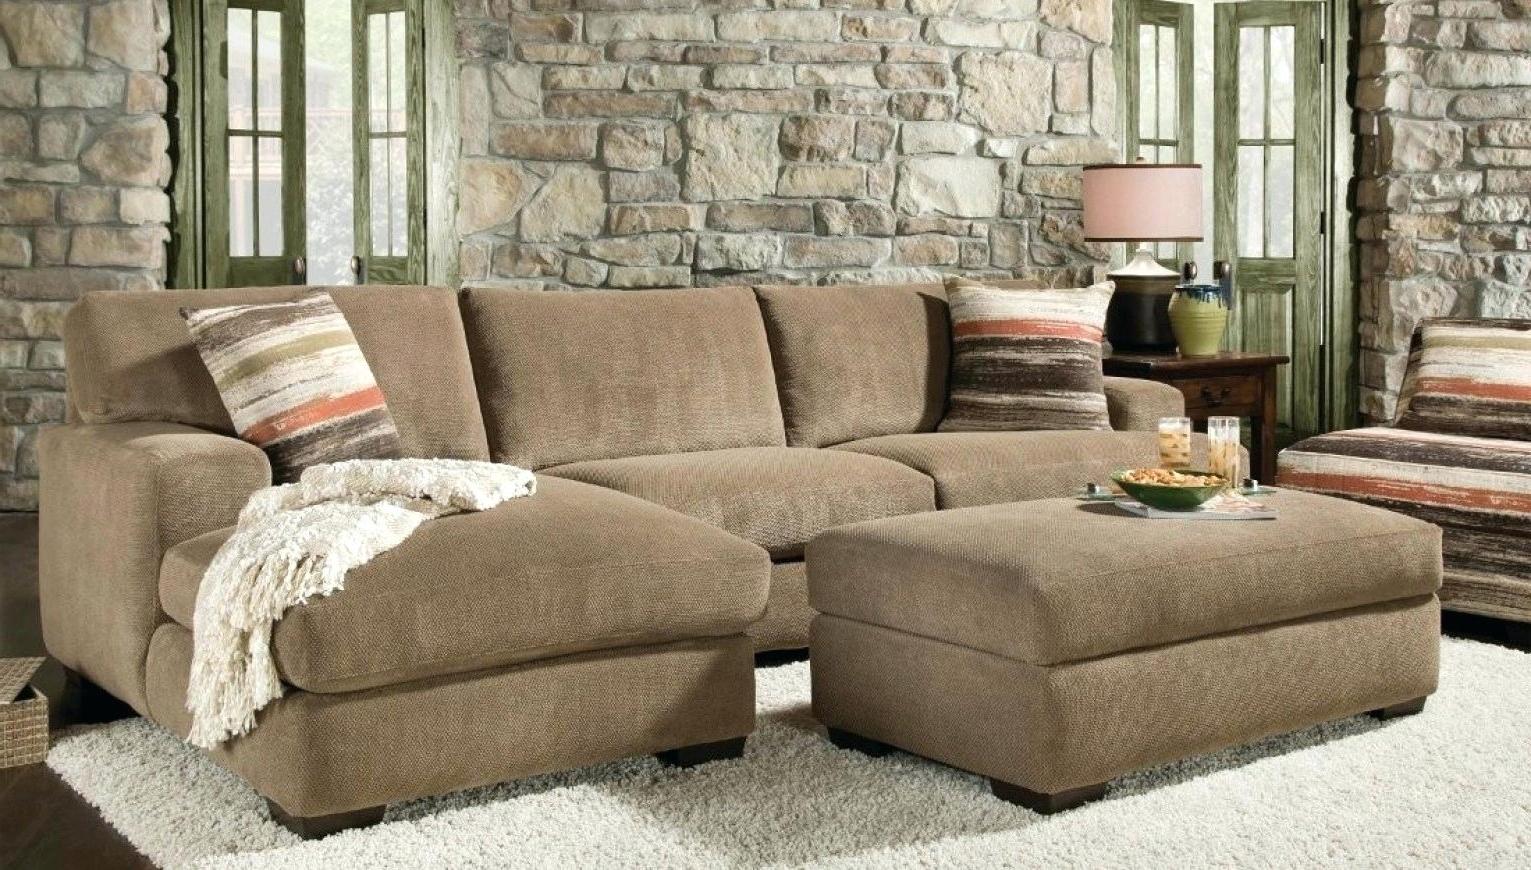 Popular Huge Sofas Intended For Oversized Sectional Sofa Sa Sas Bed Huge Sofas Sleeper (View 8 of 15)